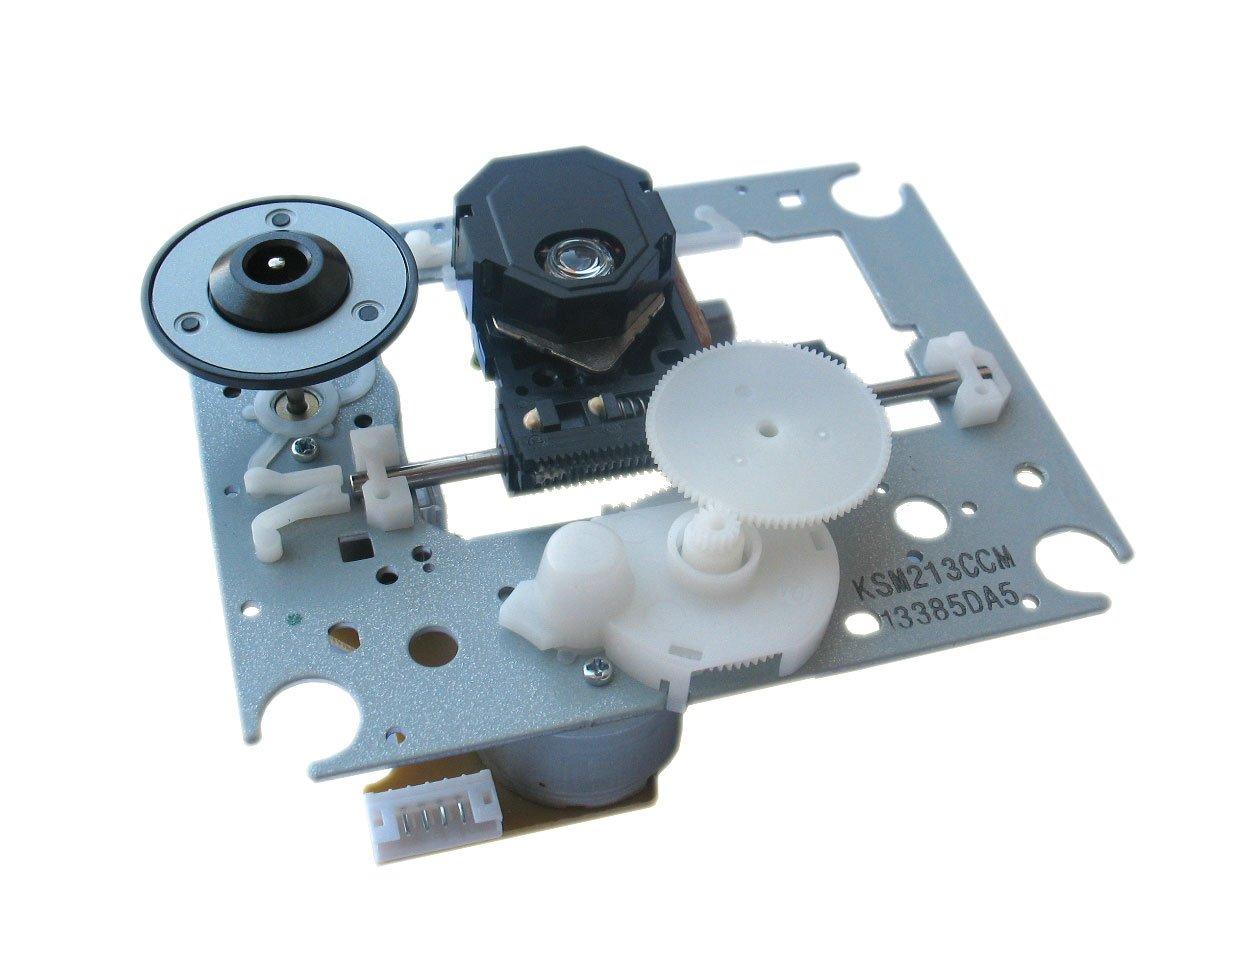 KSM-213CCM Optical Laser Lens Head KSS-213C with Mechanism